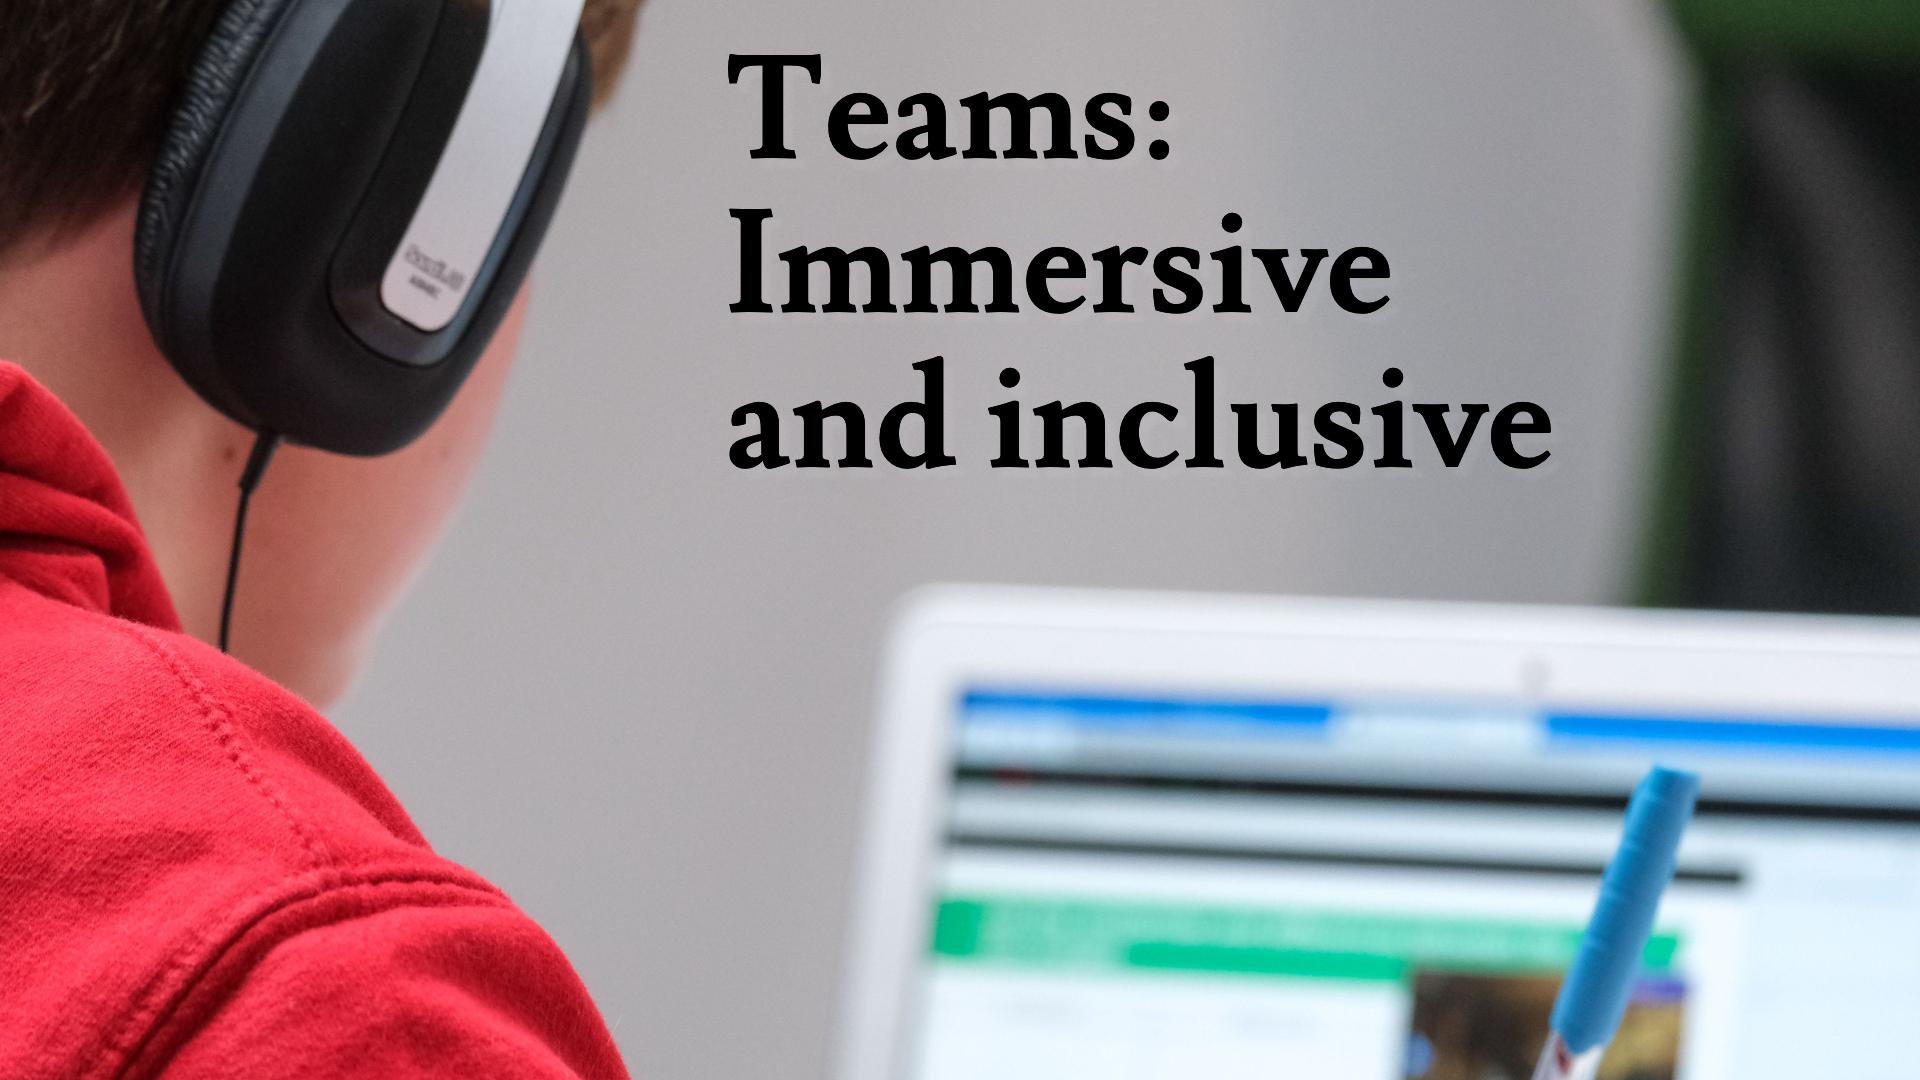 Microsoft Teams: Immersive and Inclusive